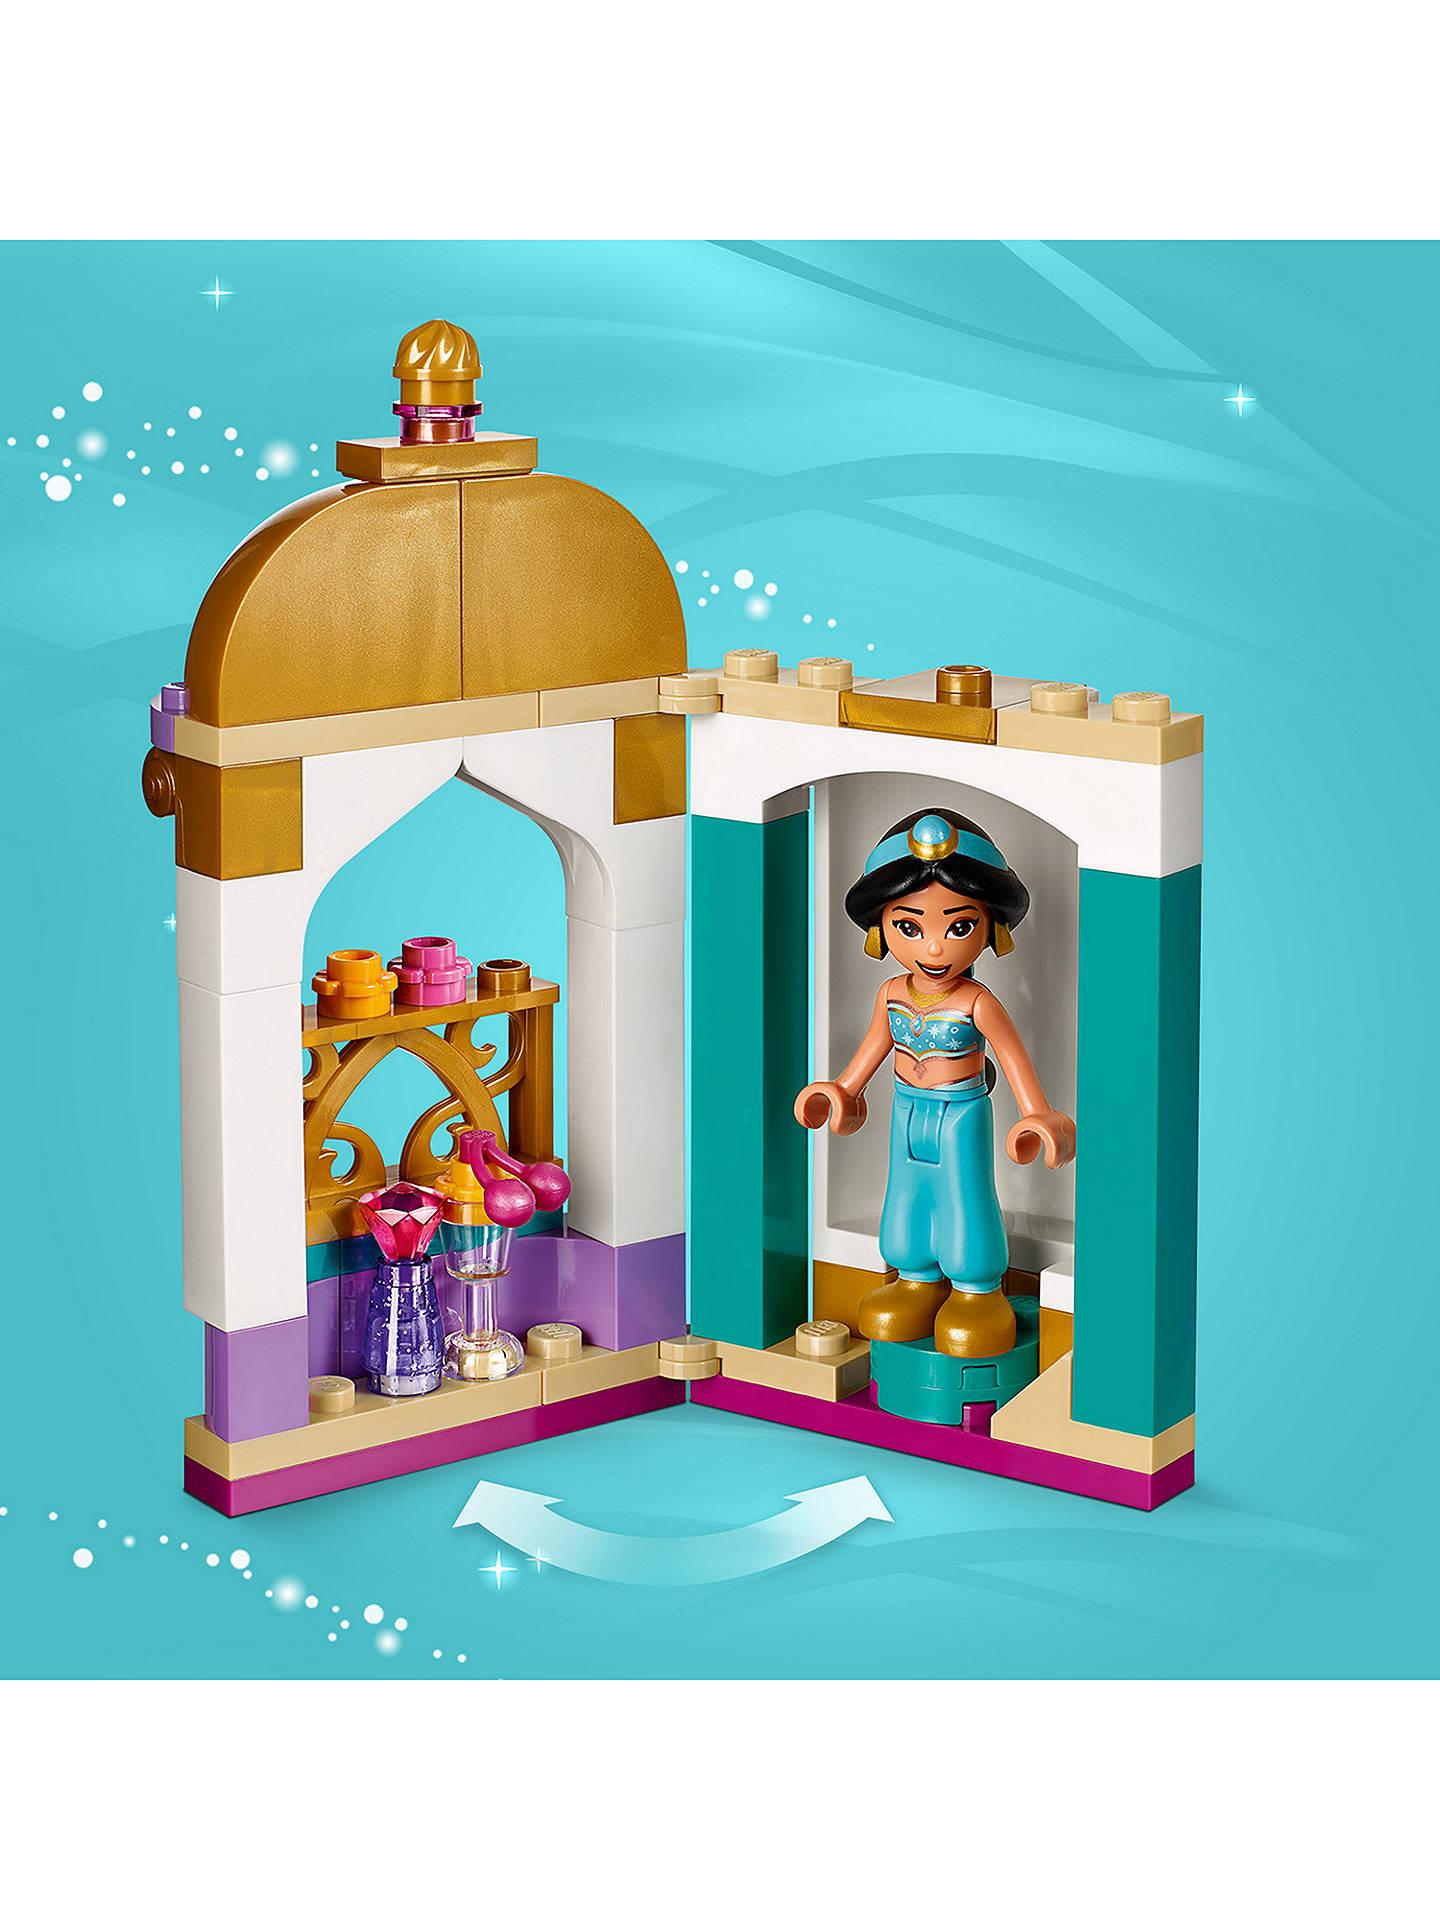 41158 LEGO Disney Princess: Jasmine/'s Petite Tower New 2019 49 Pieces